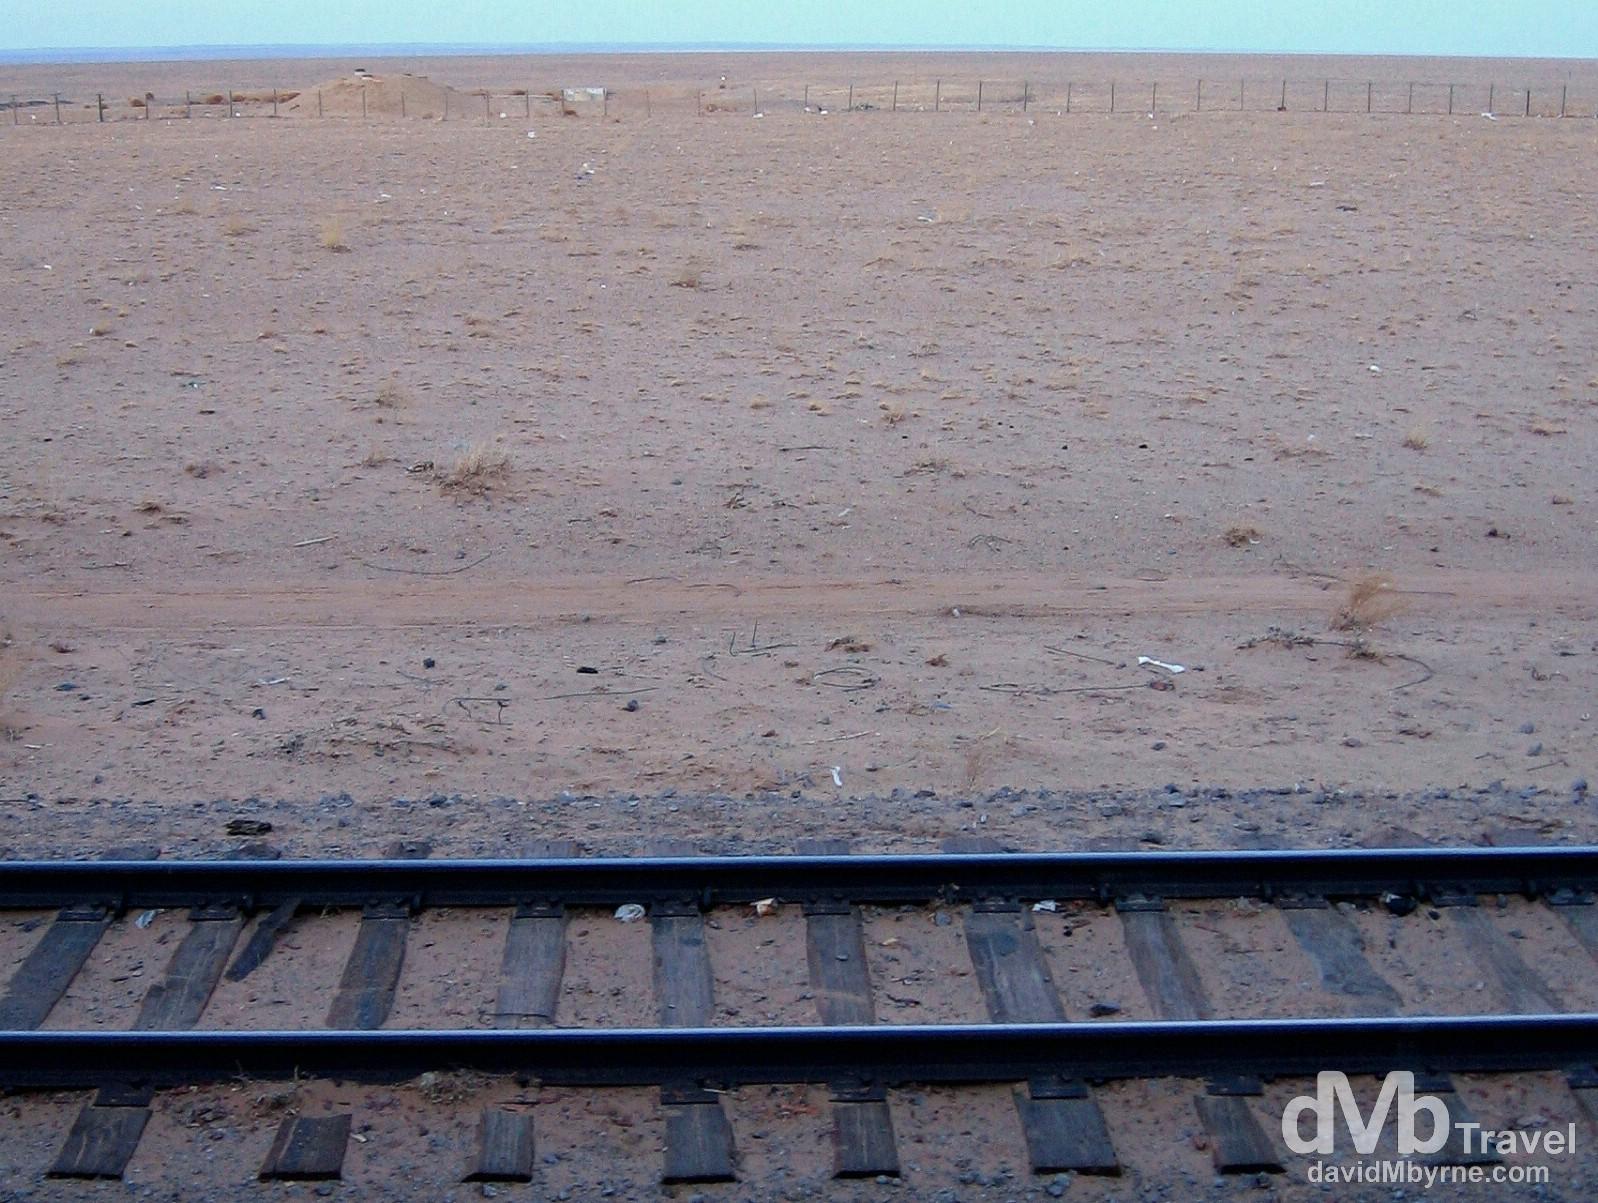 At the China/Mongolia boarder crossing, Zamyn-Uud, southern Mongolia. February 14, 2006.